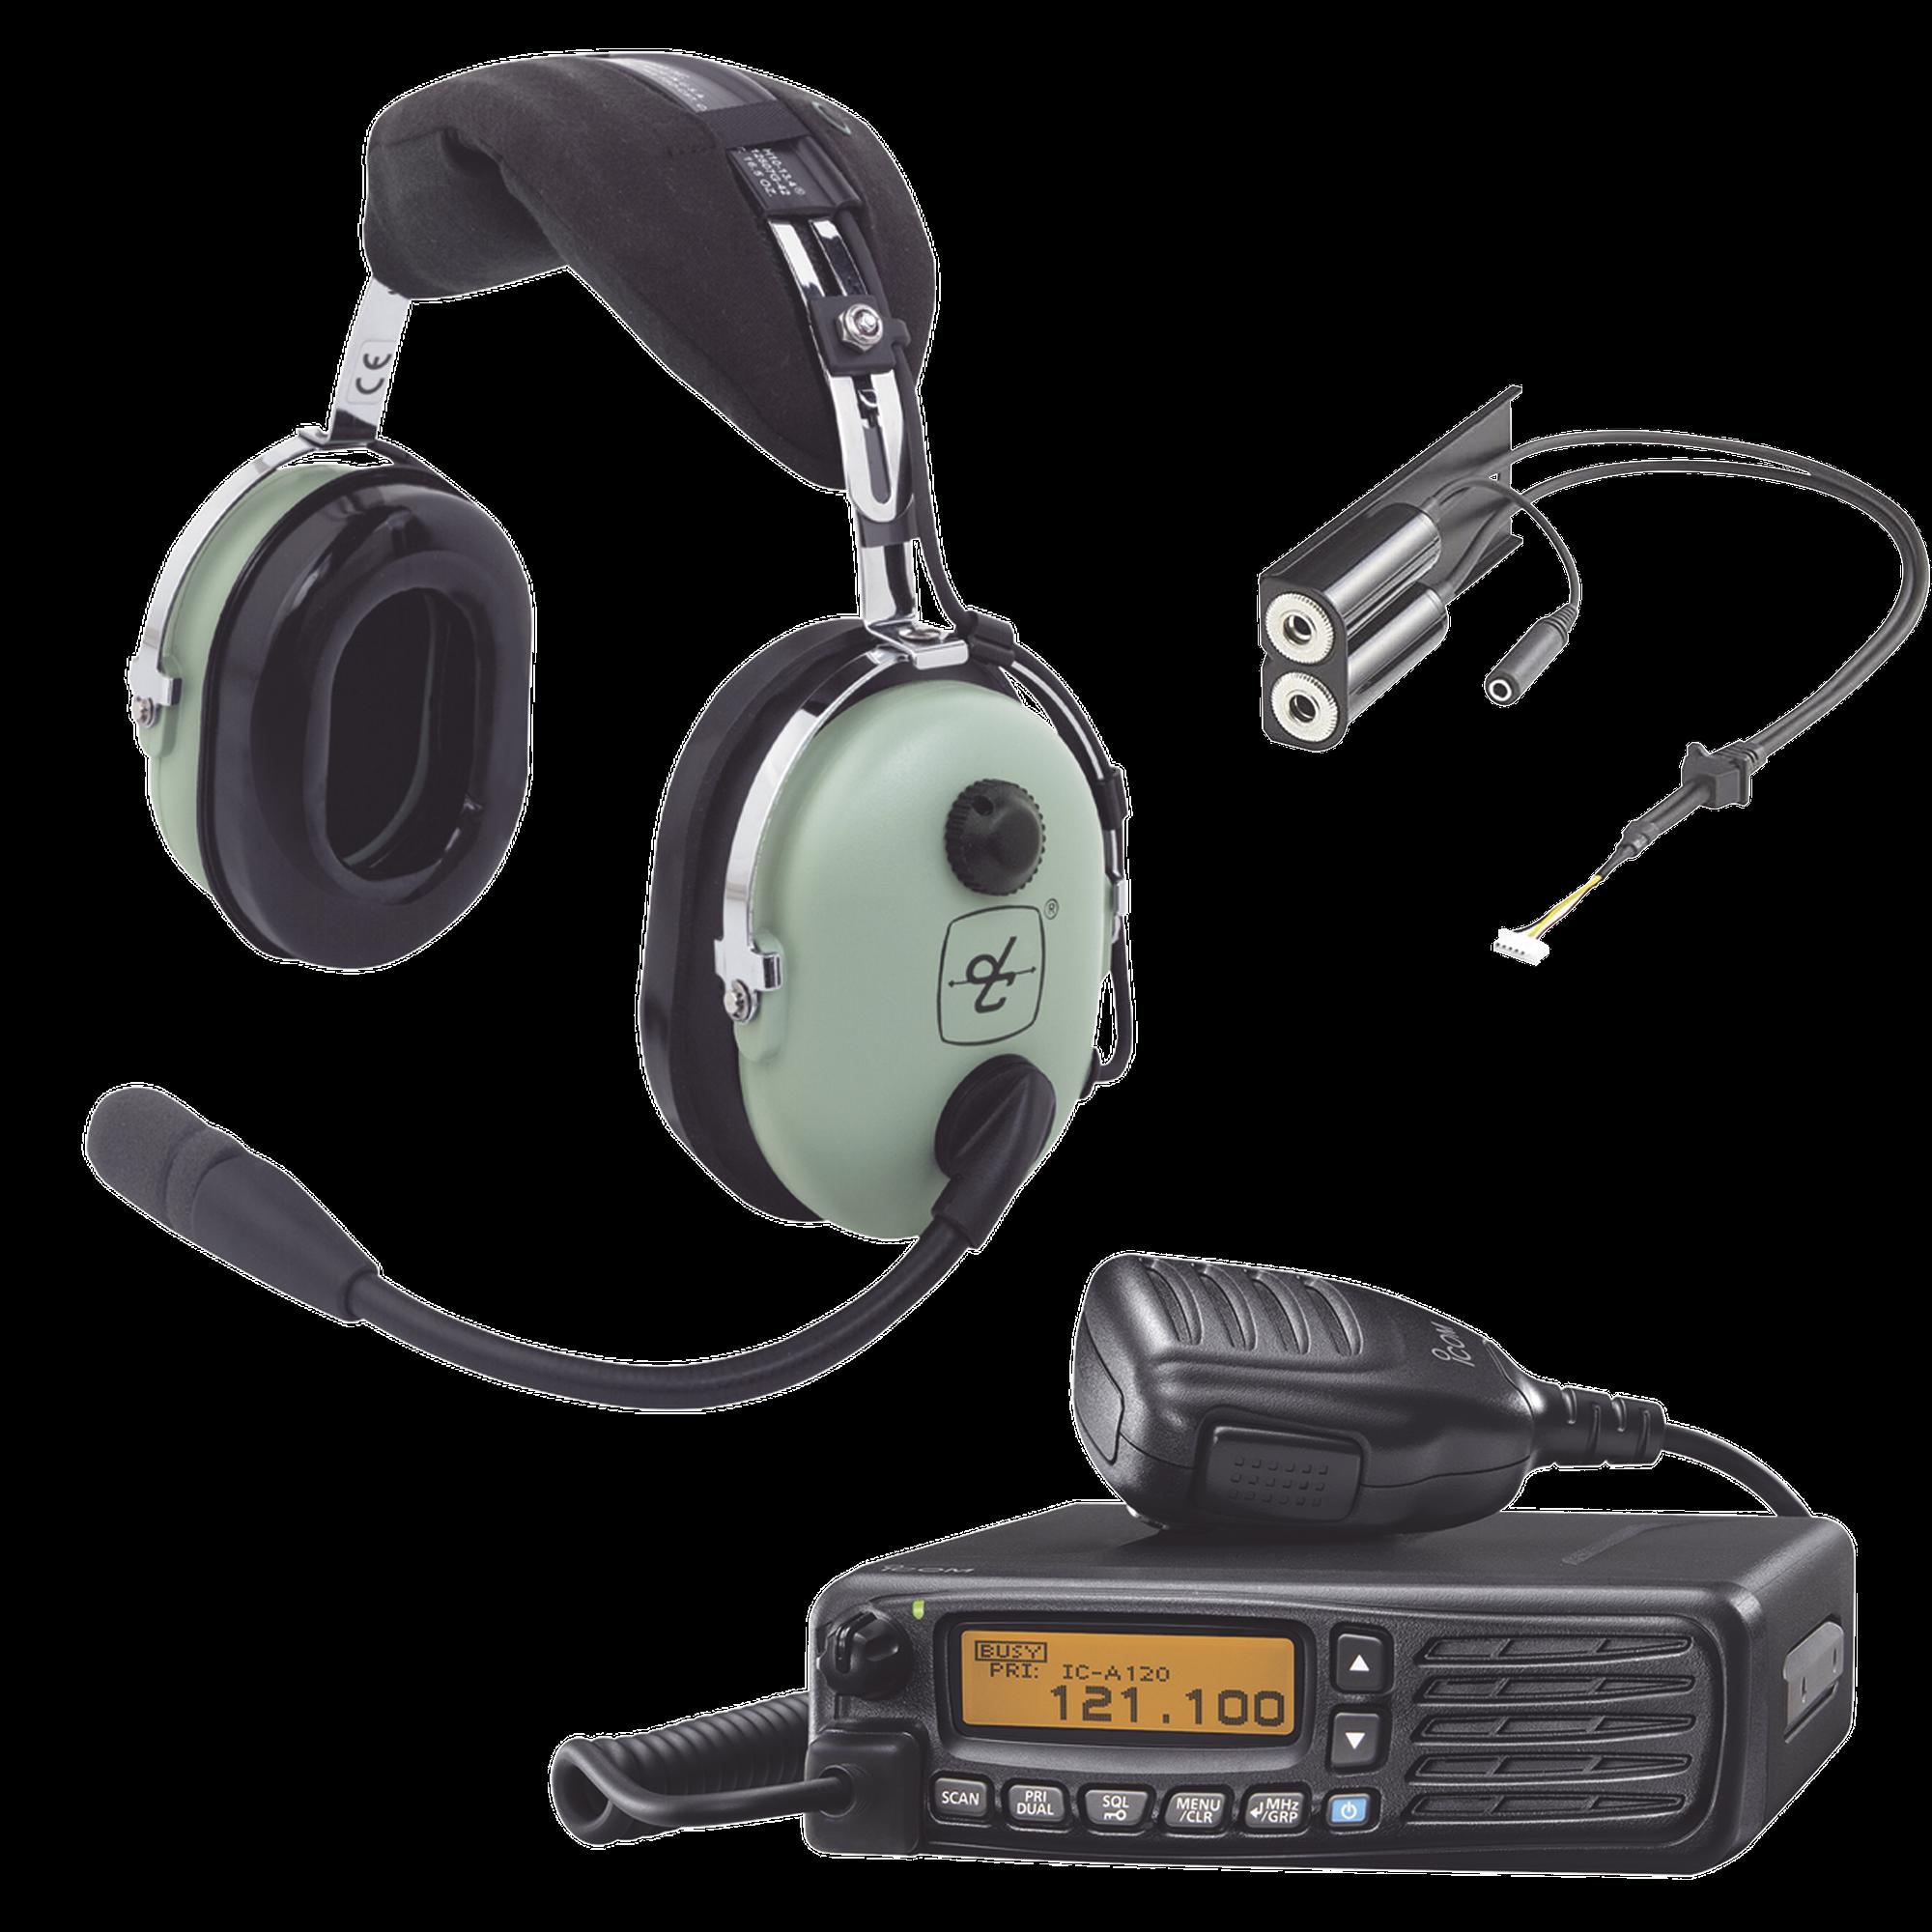 Kit Radio Movil Aéreo Icom con Auricular David Clark para Aviación General